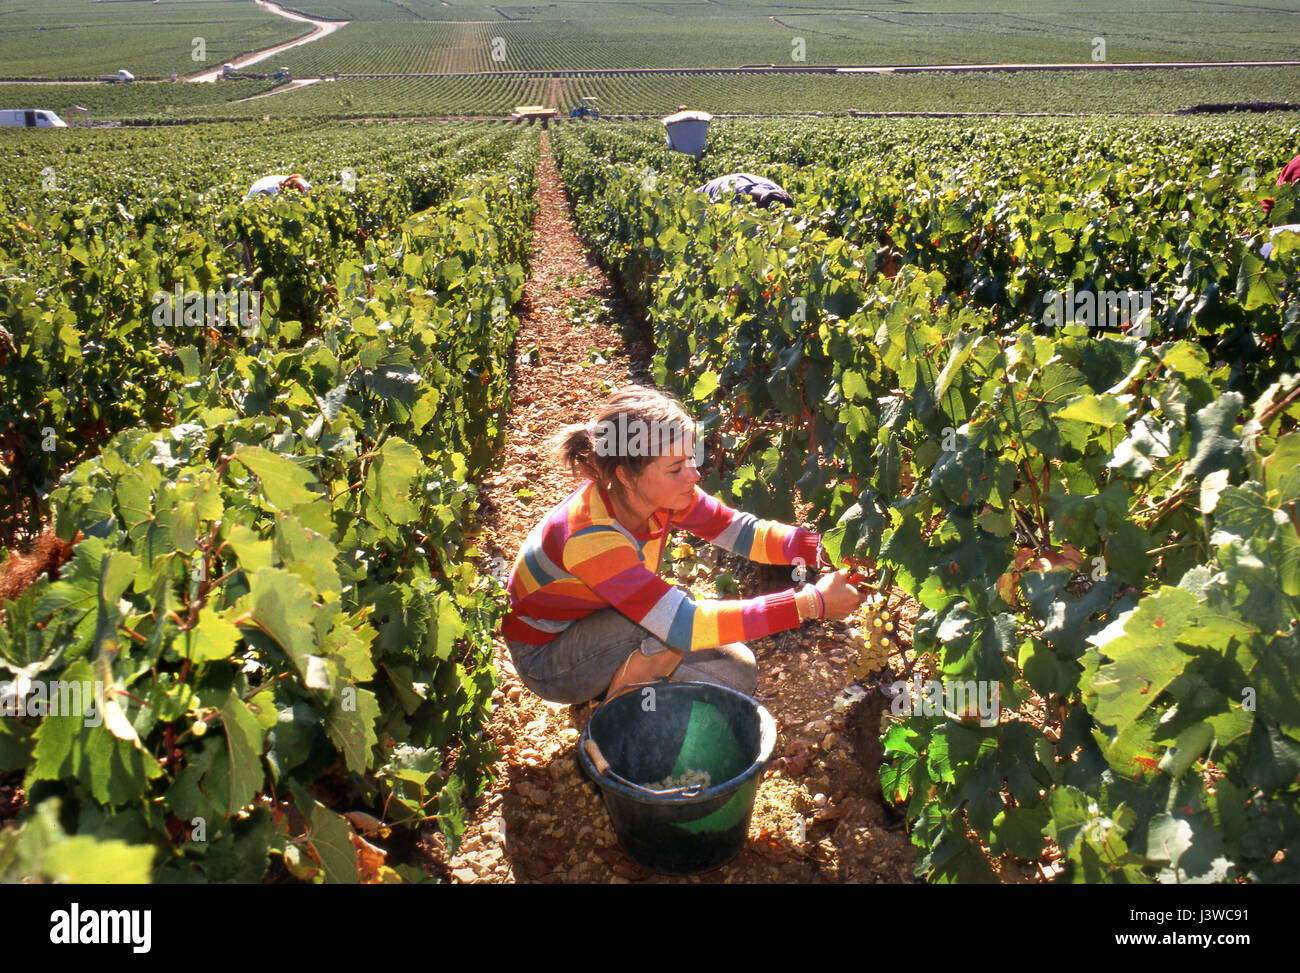 Sophie harvesting Chardonnay grapes in Chevaliers-Montrachet vineyard of Michel Colin-Deleger, Puligny-Montrachet, - Stock Image